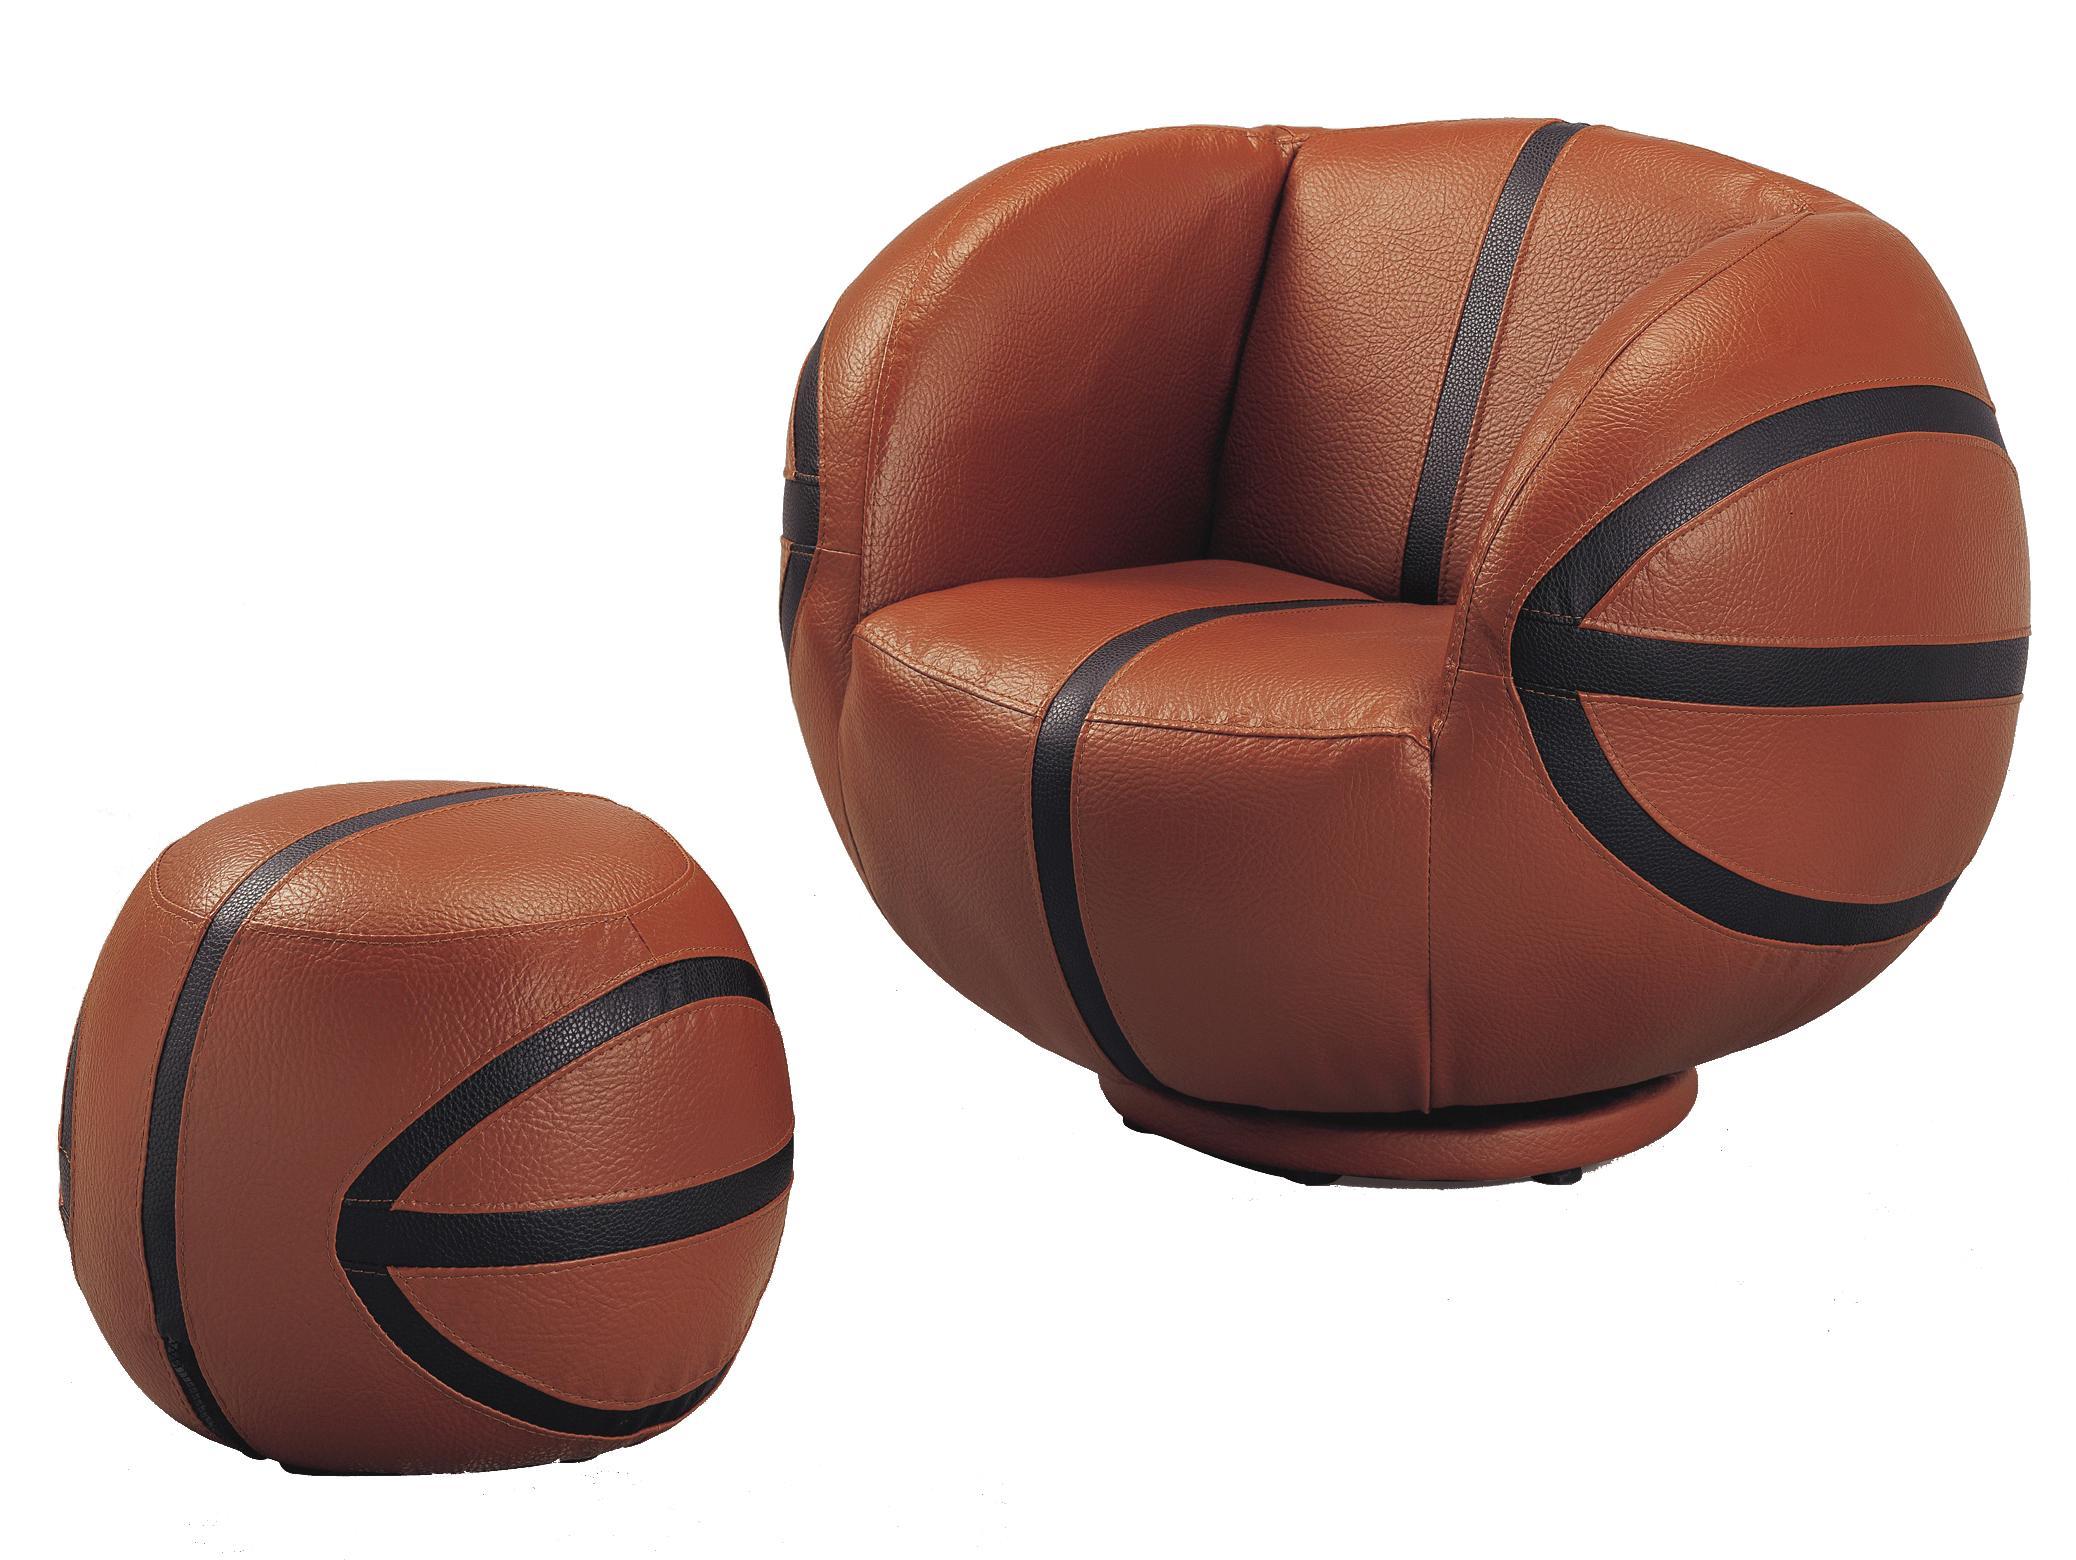 Crown Mark Kids Sport Chairs 7002 Basketball Swivel Chair